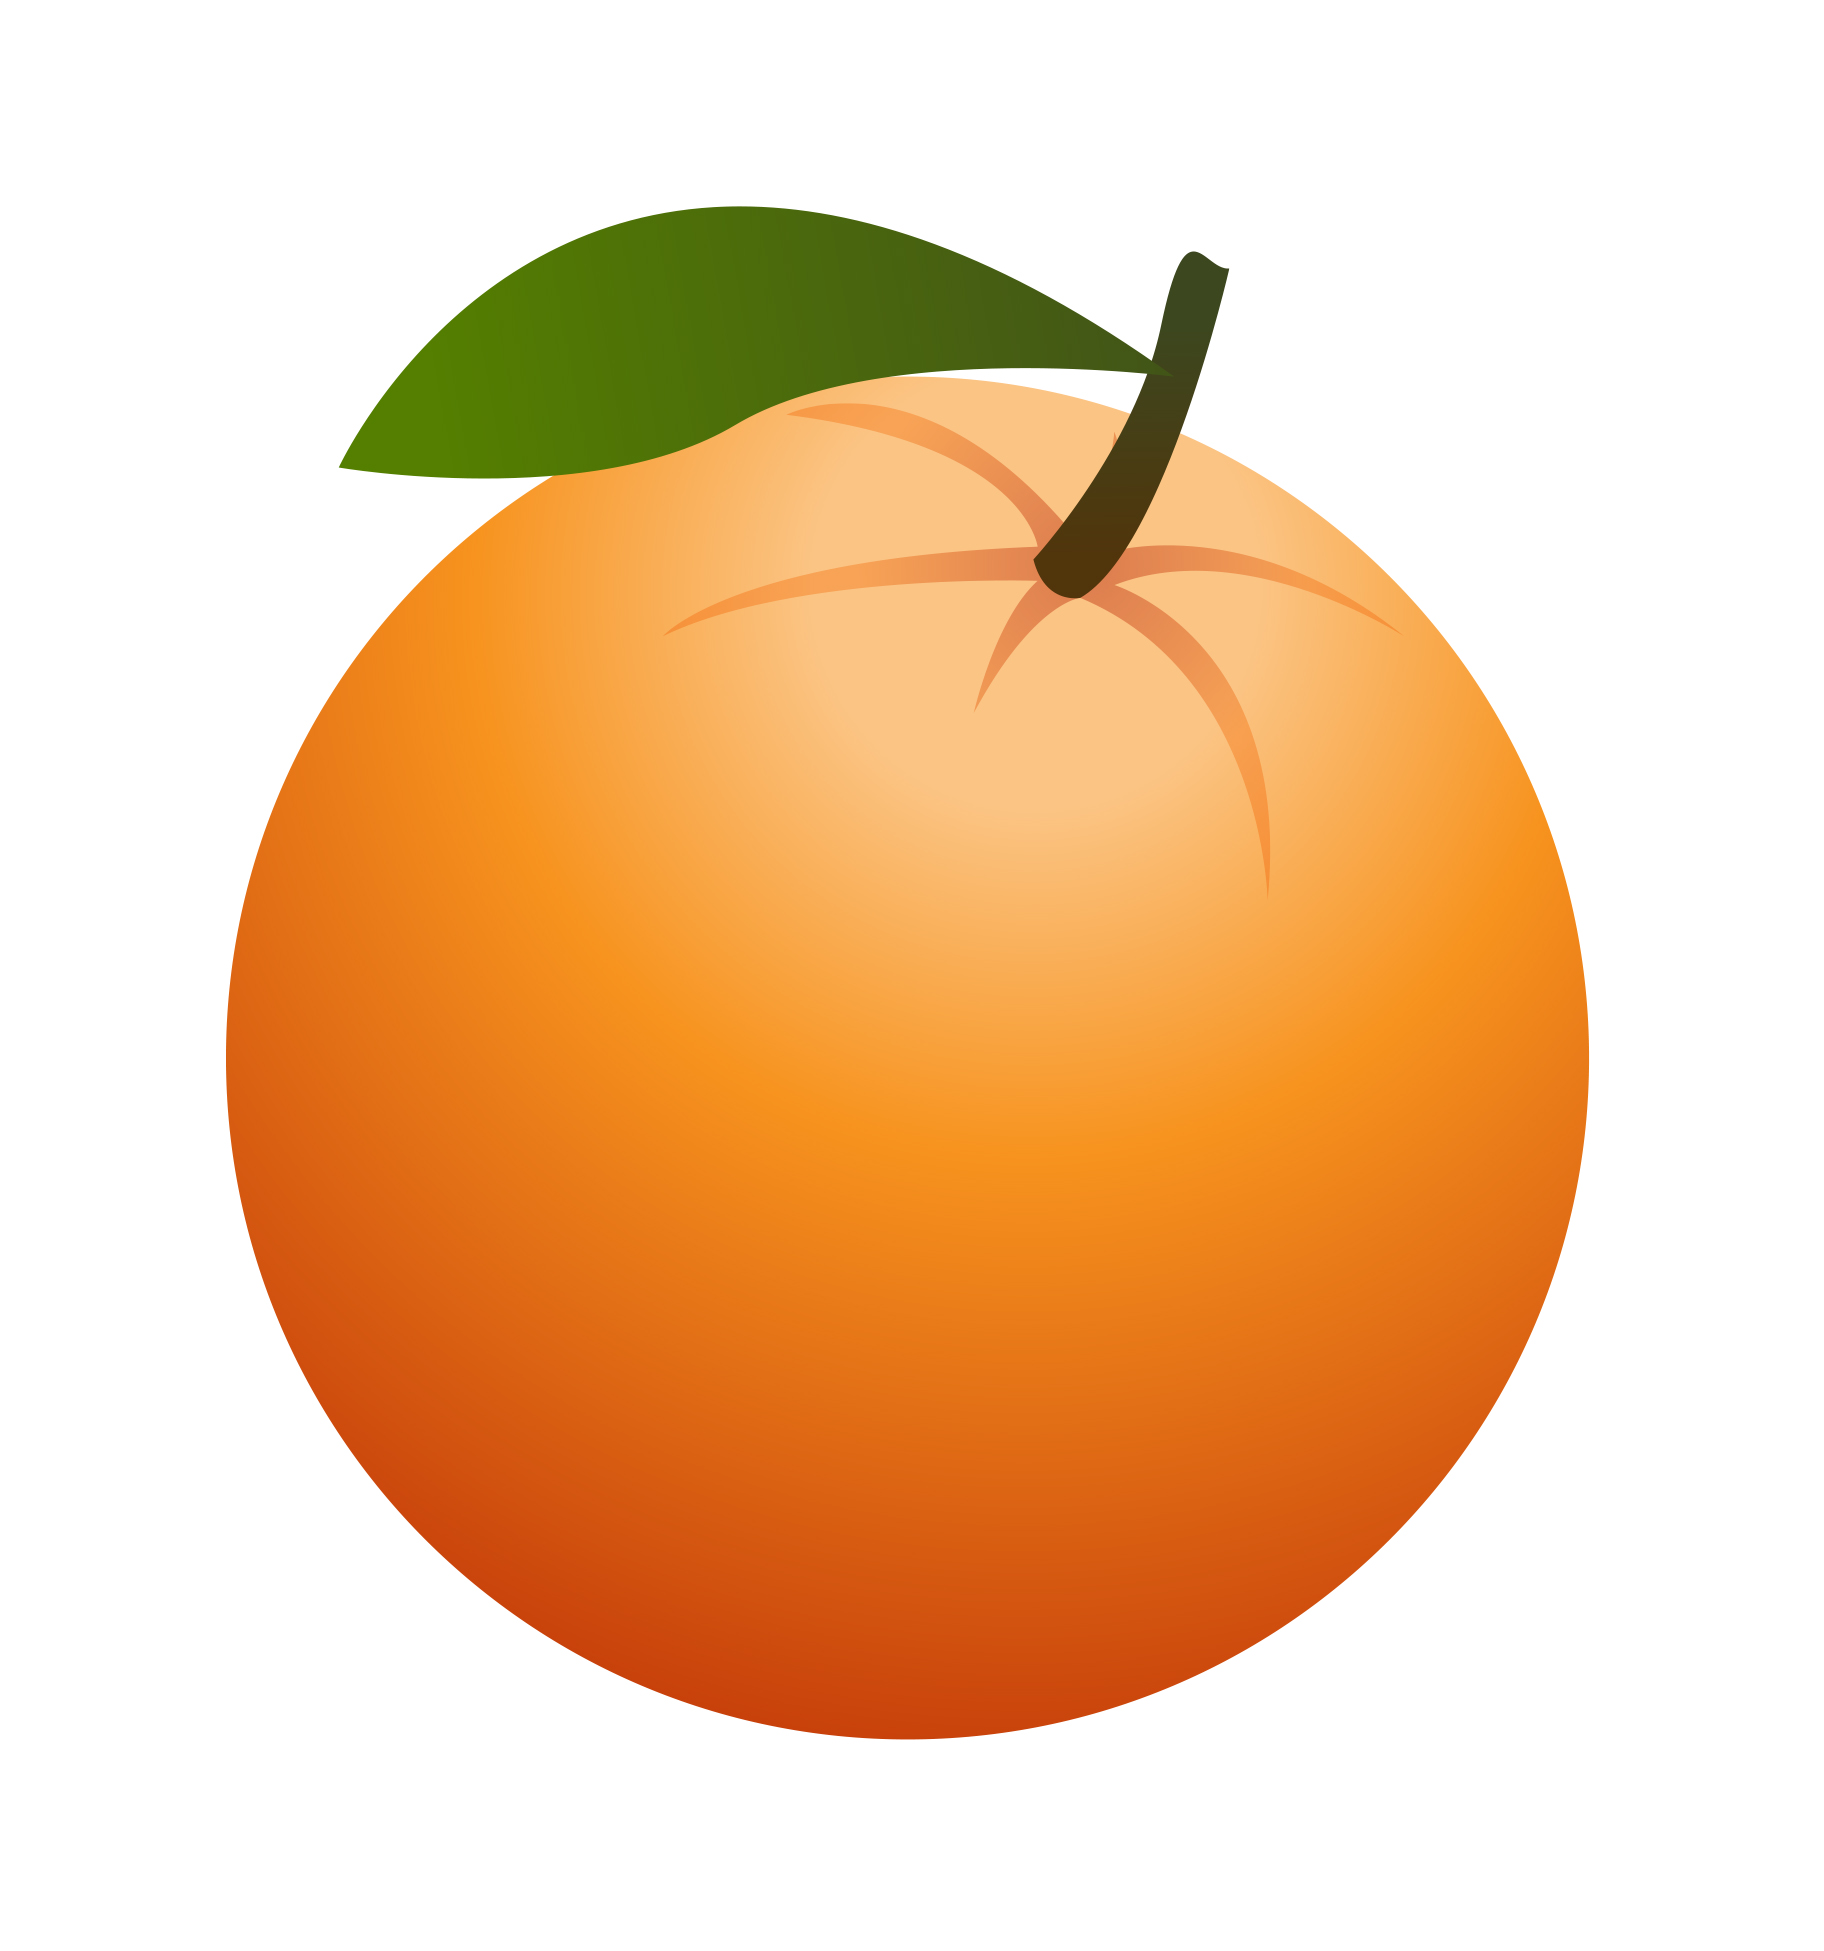 Orange free clipart graphic freeuse stock Free Orange Cliparts, Download Free Clip Art, Free Clip Art on ... graphic freeuse stock